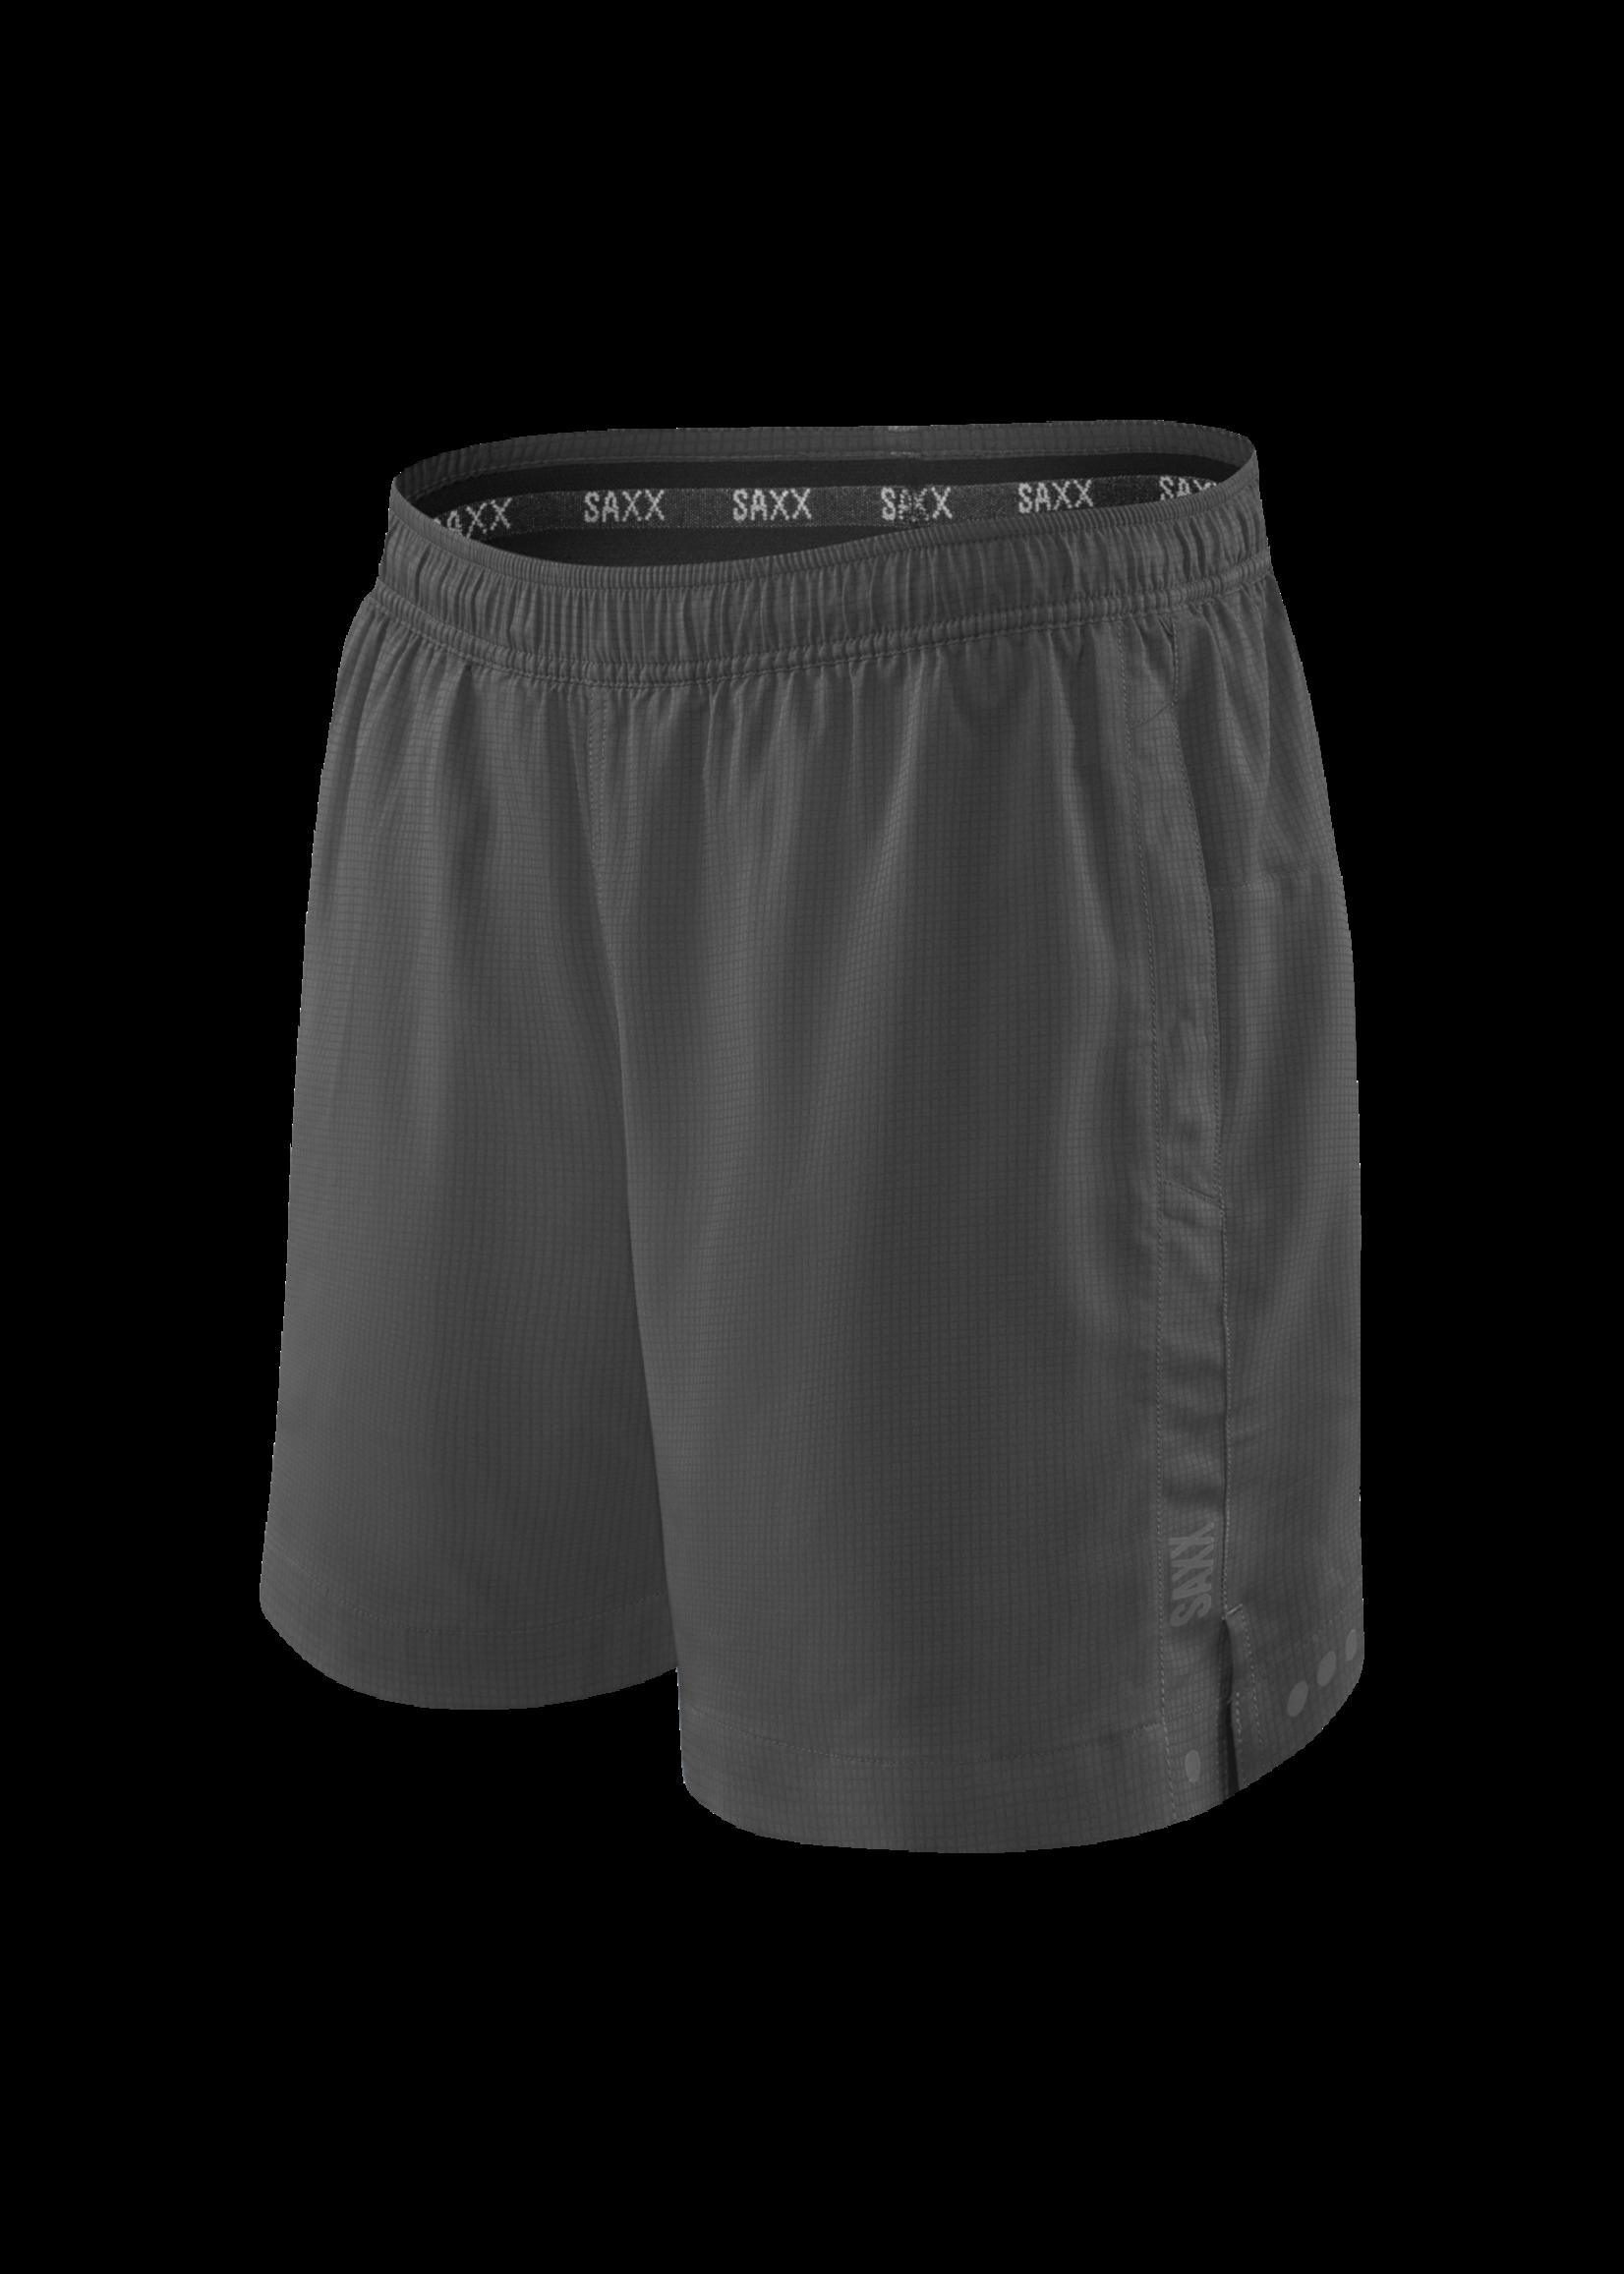 Saxx Underwear Saxx Kinetic 2N1 Sport Shorts